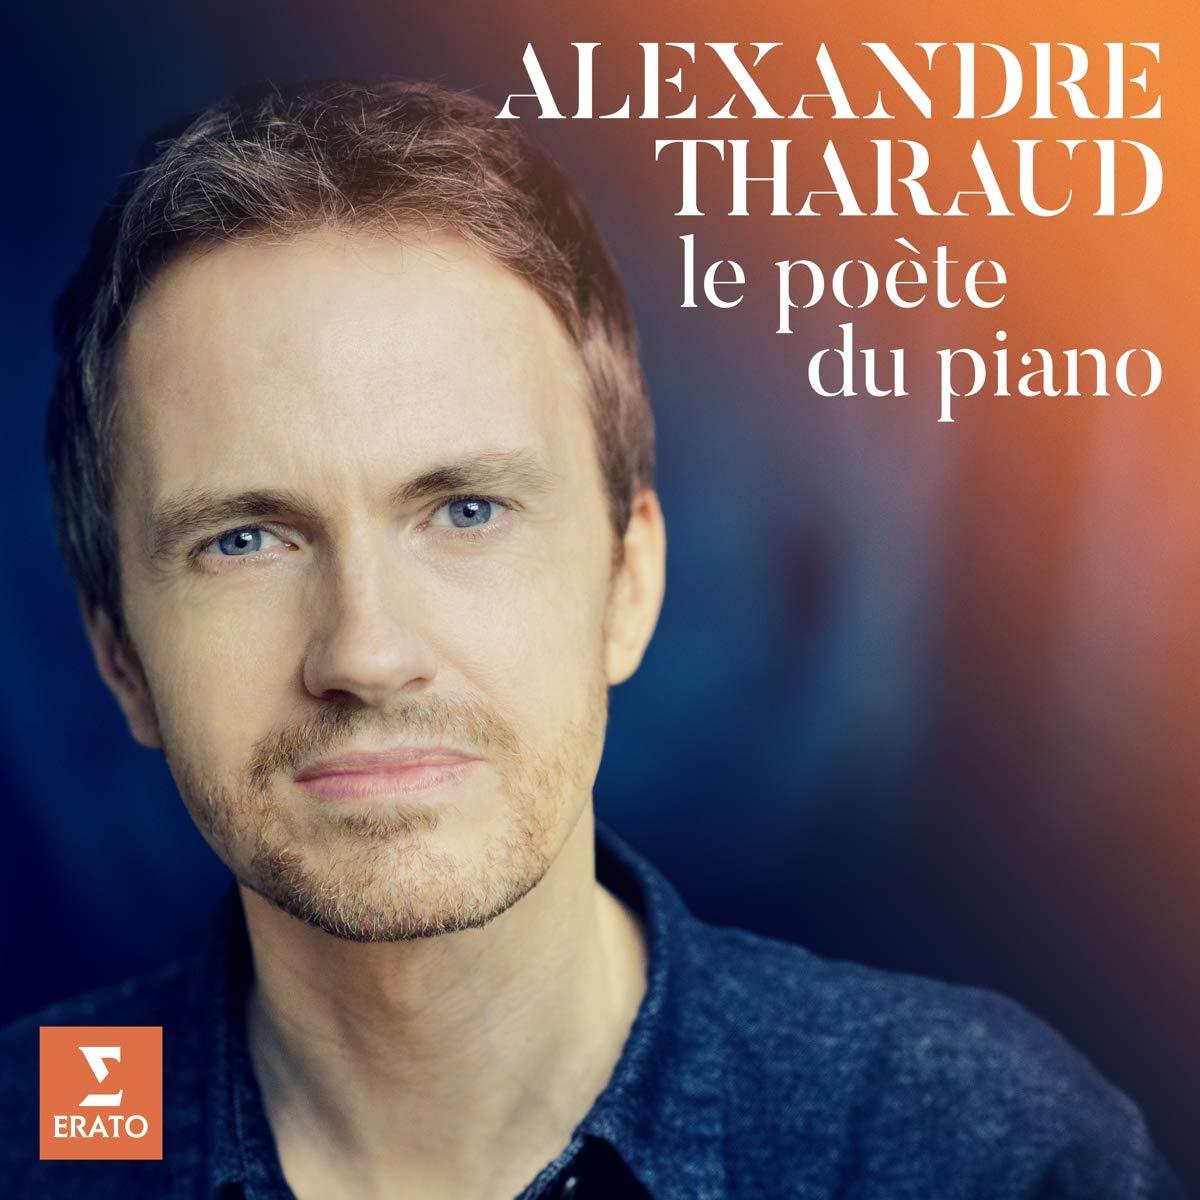 Reseña CD: Alexandre Tharaud: le poète du piano